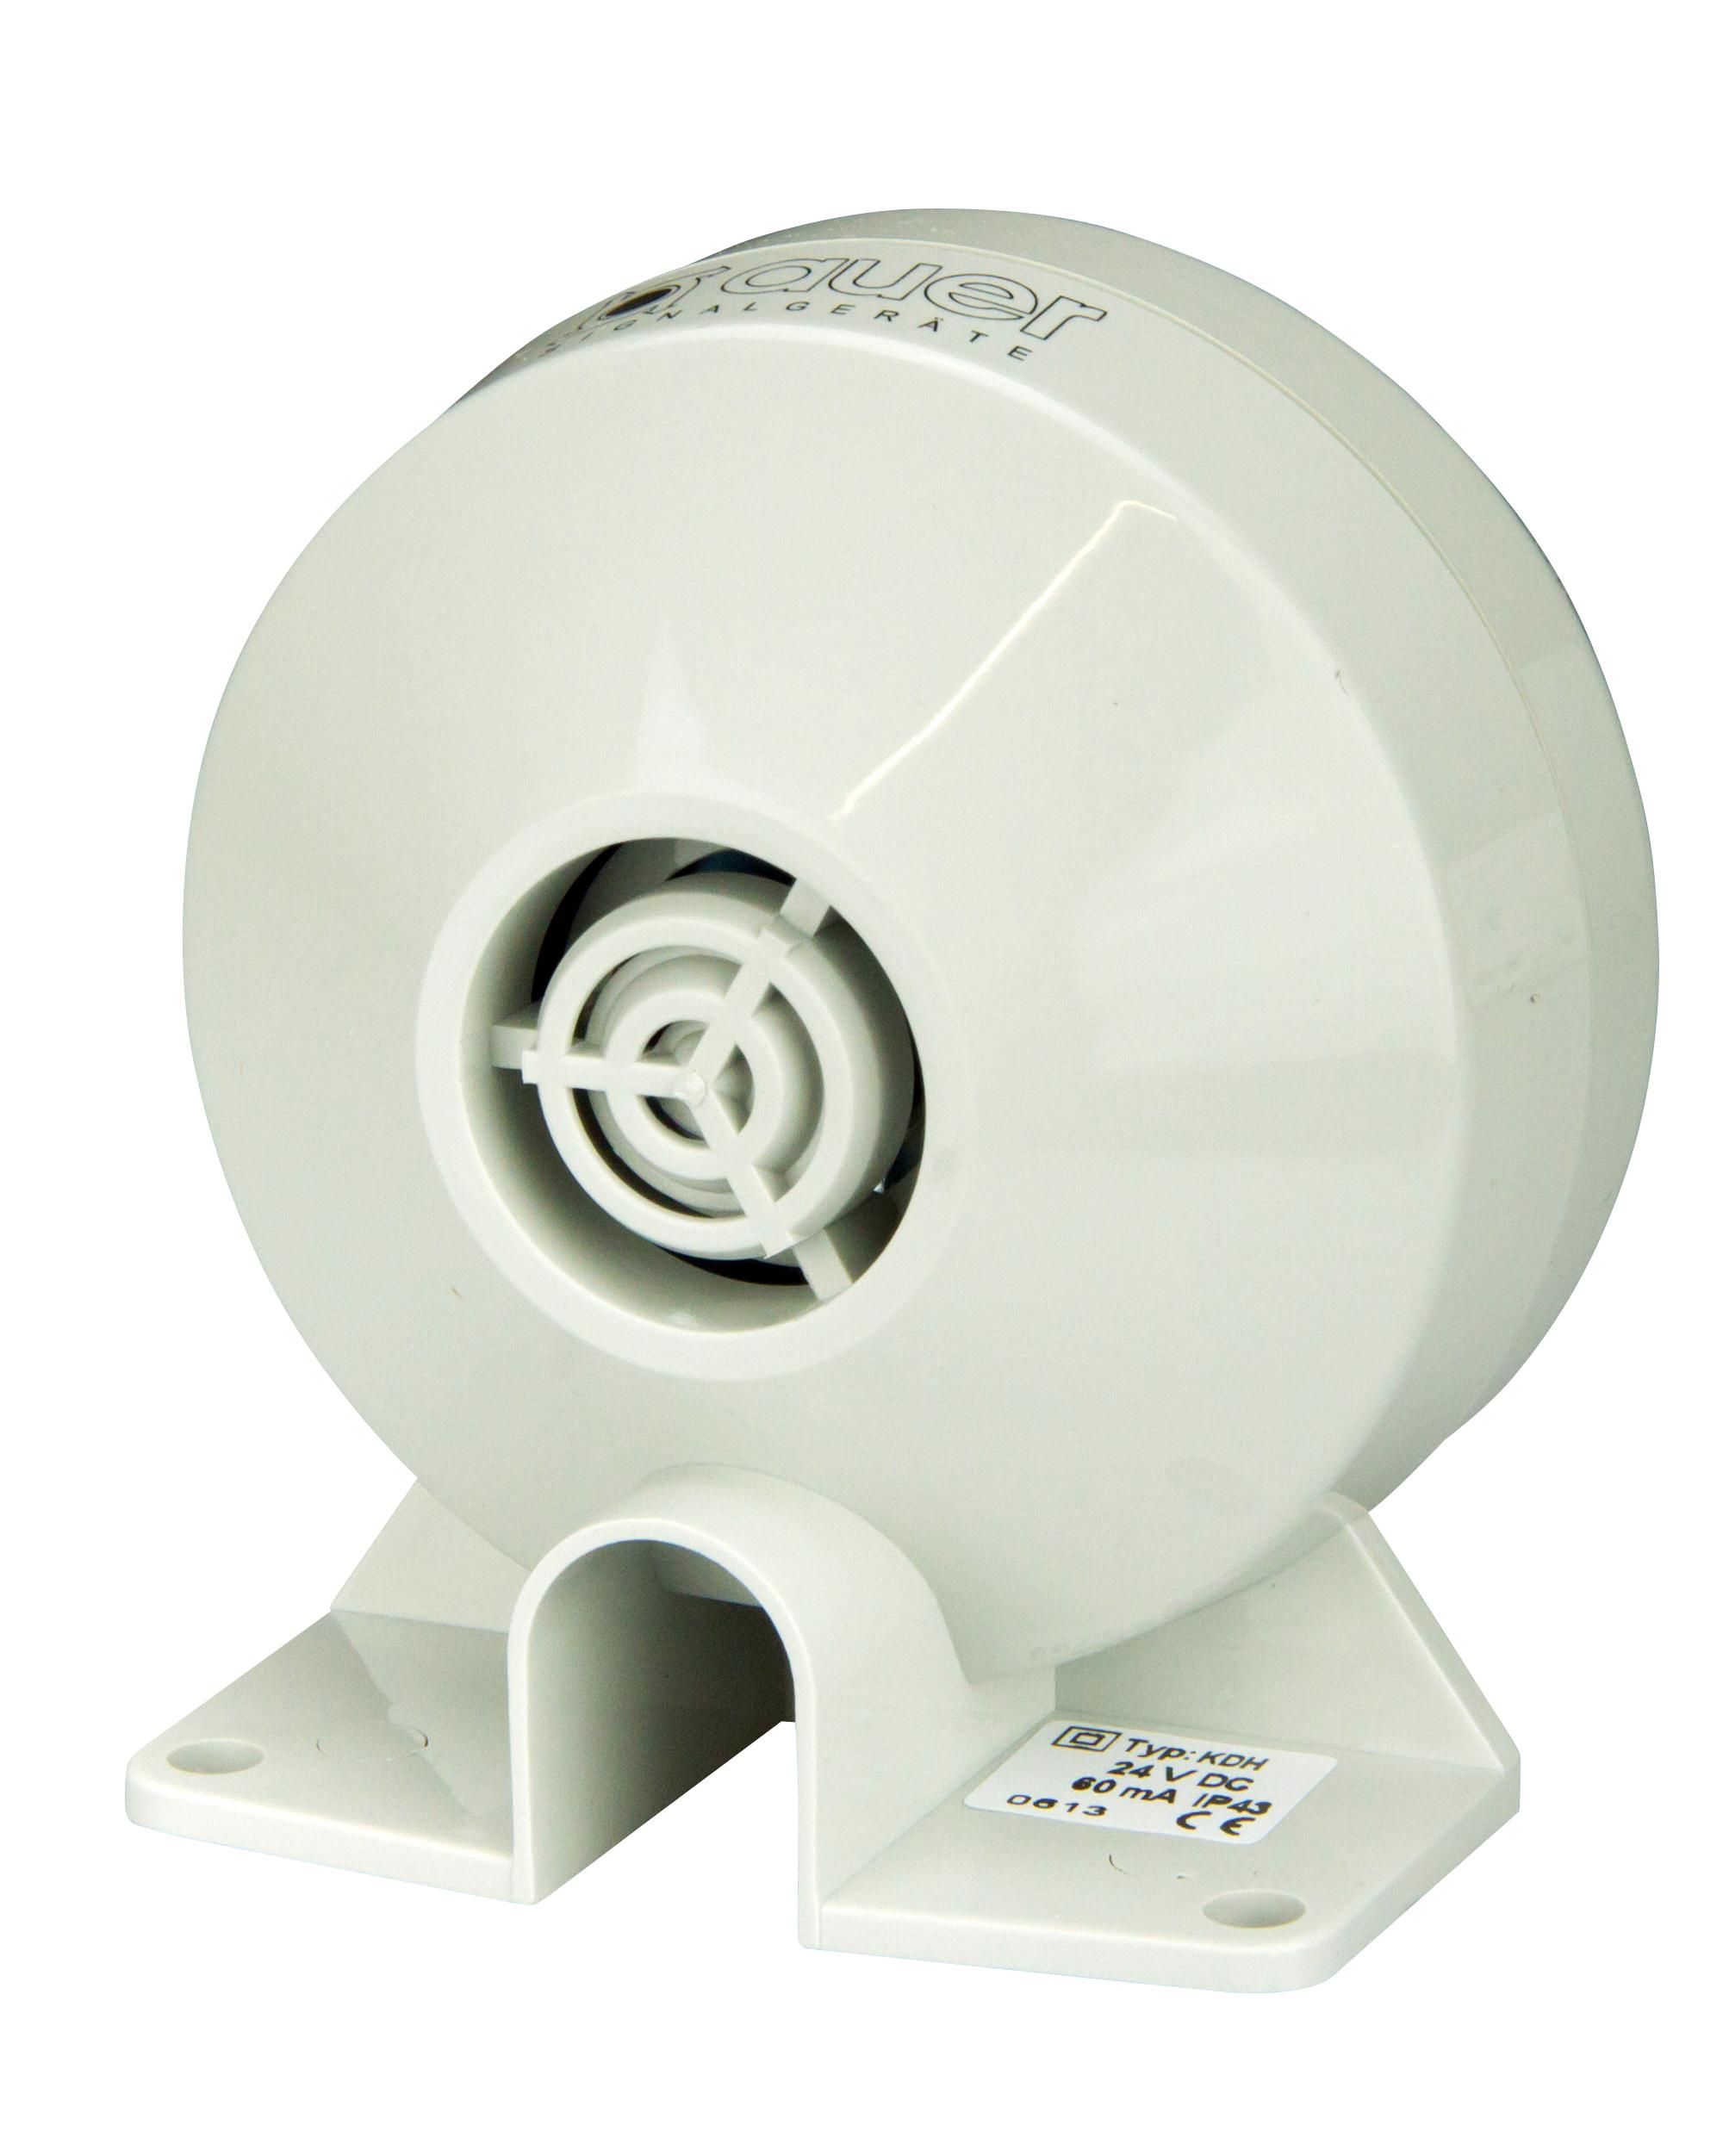 1 Stk Signalhupe 24V / 90dBA COSH24----